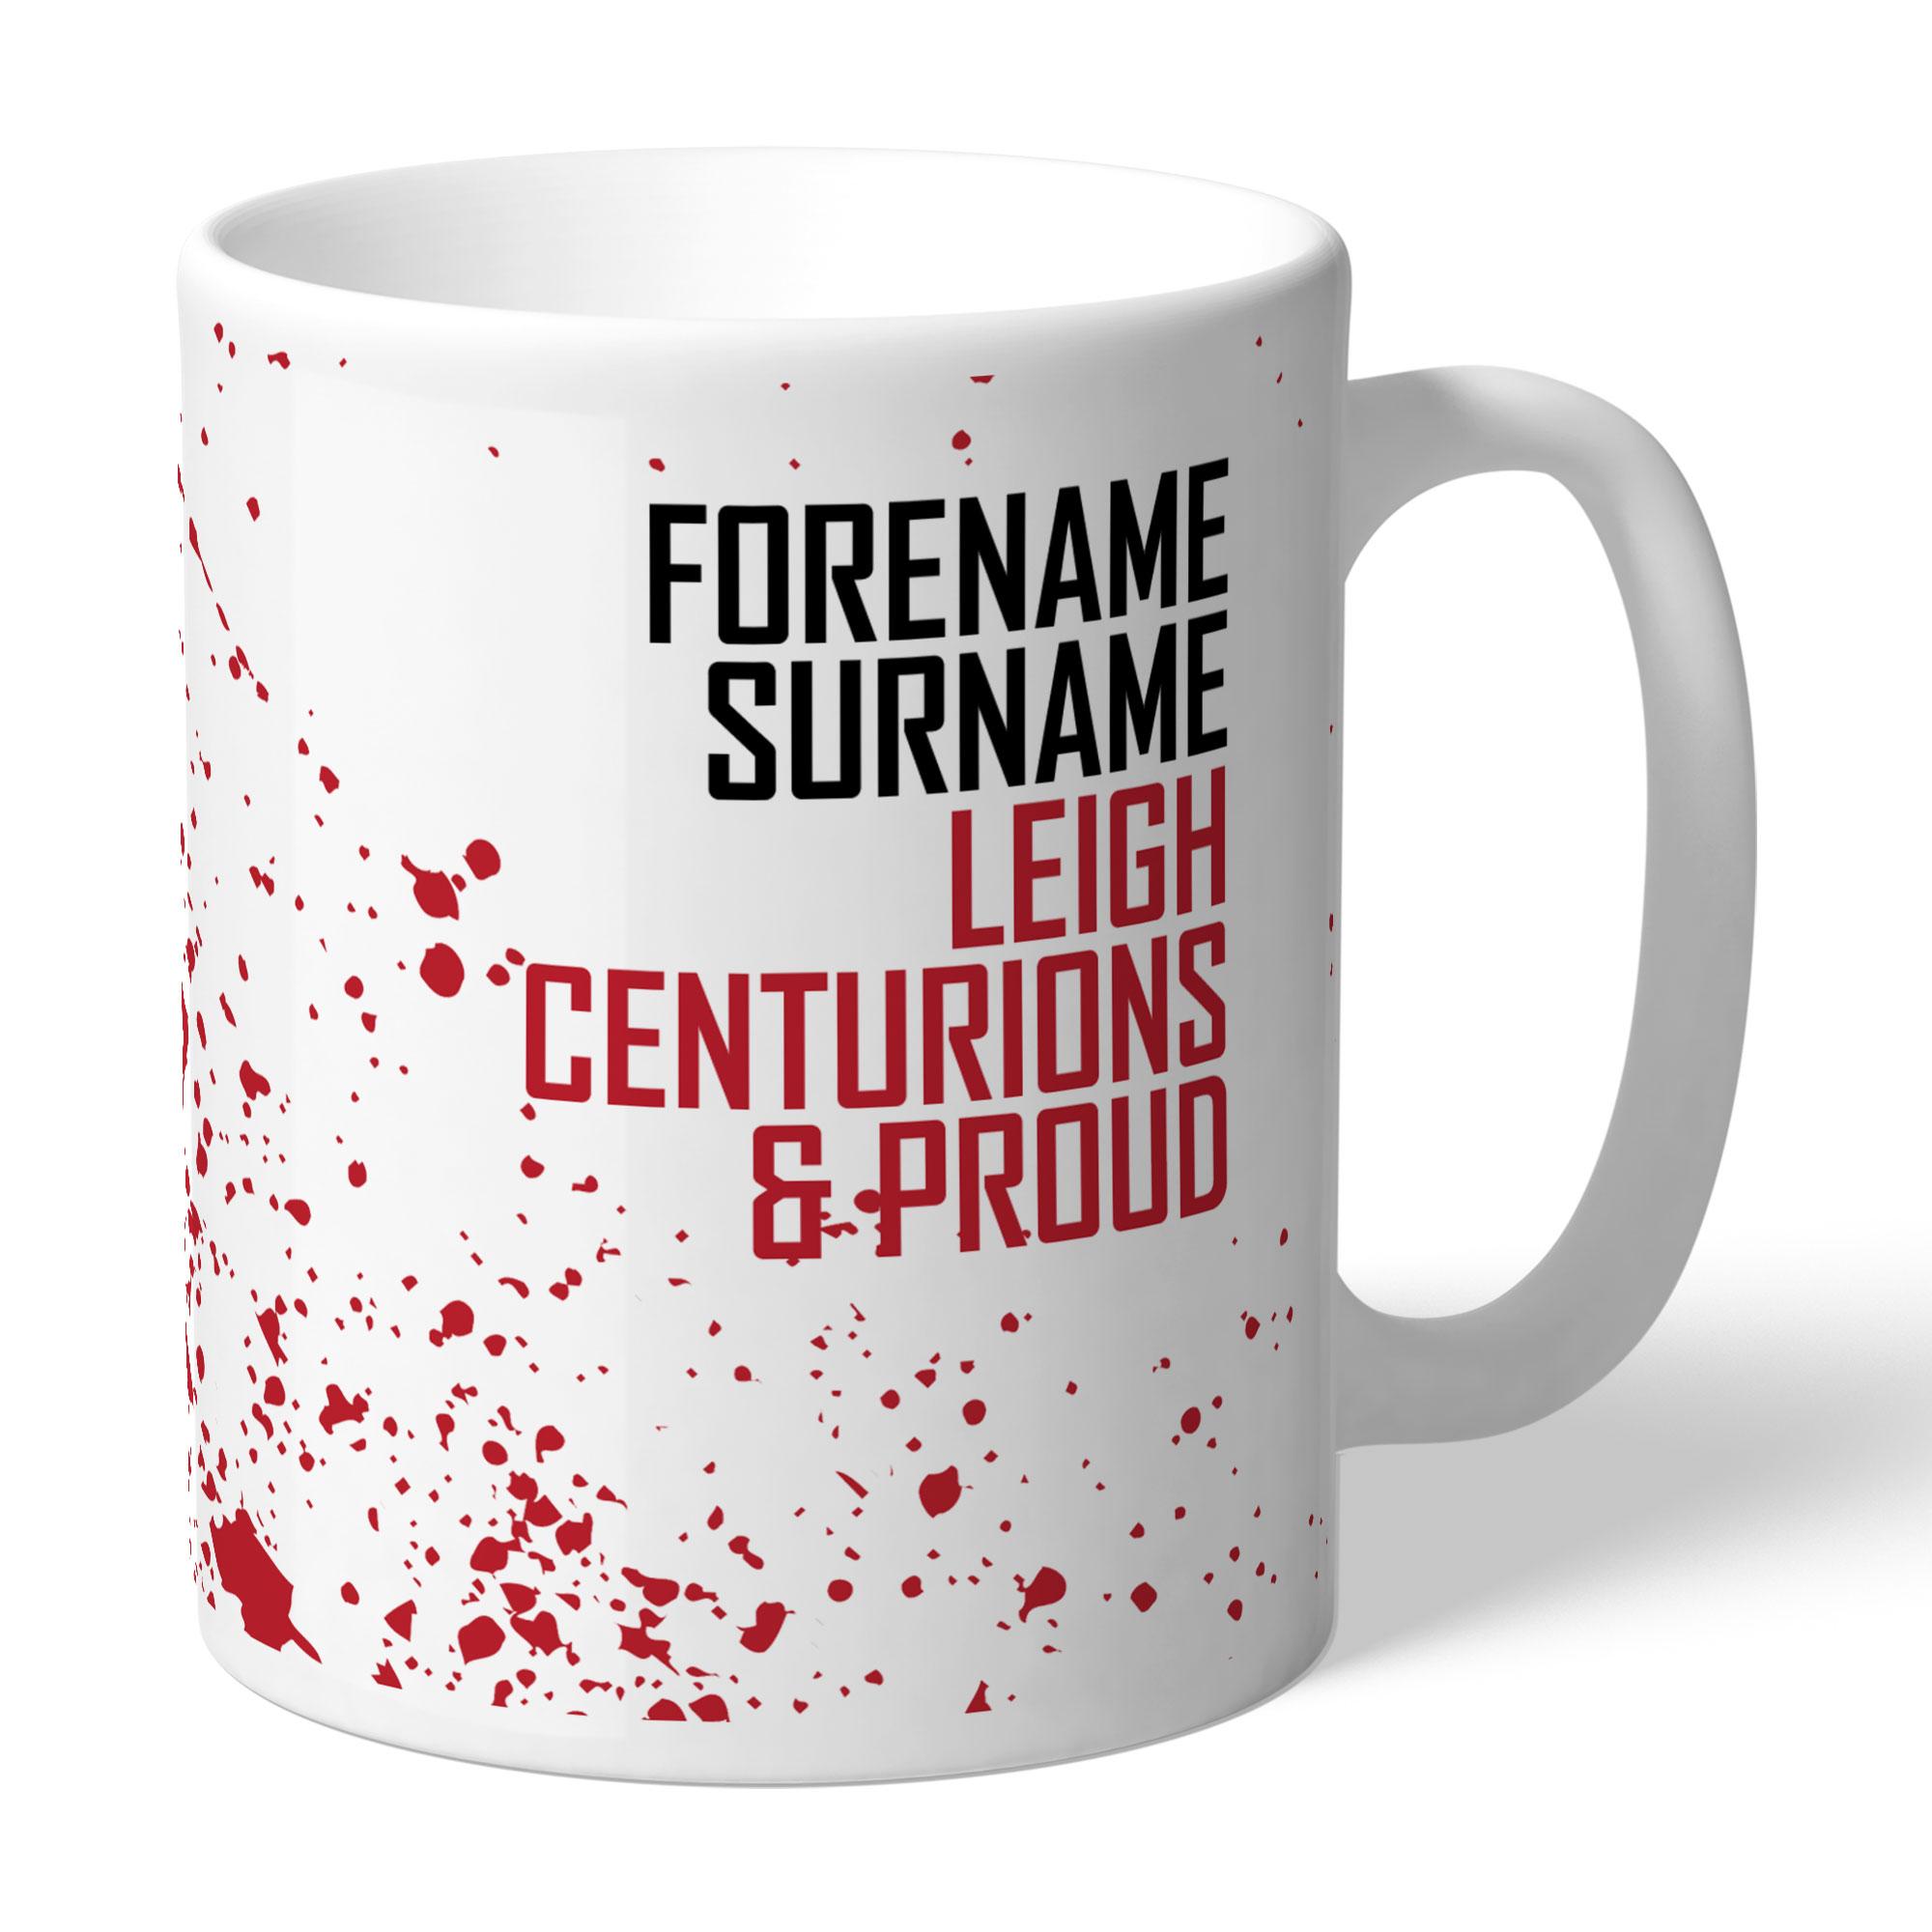 Leigh Centurions Proud Mug